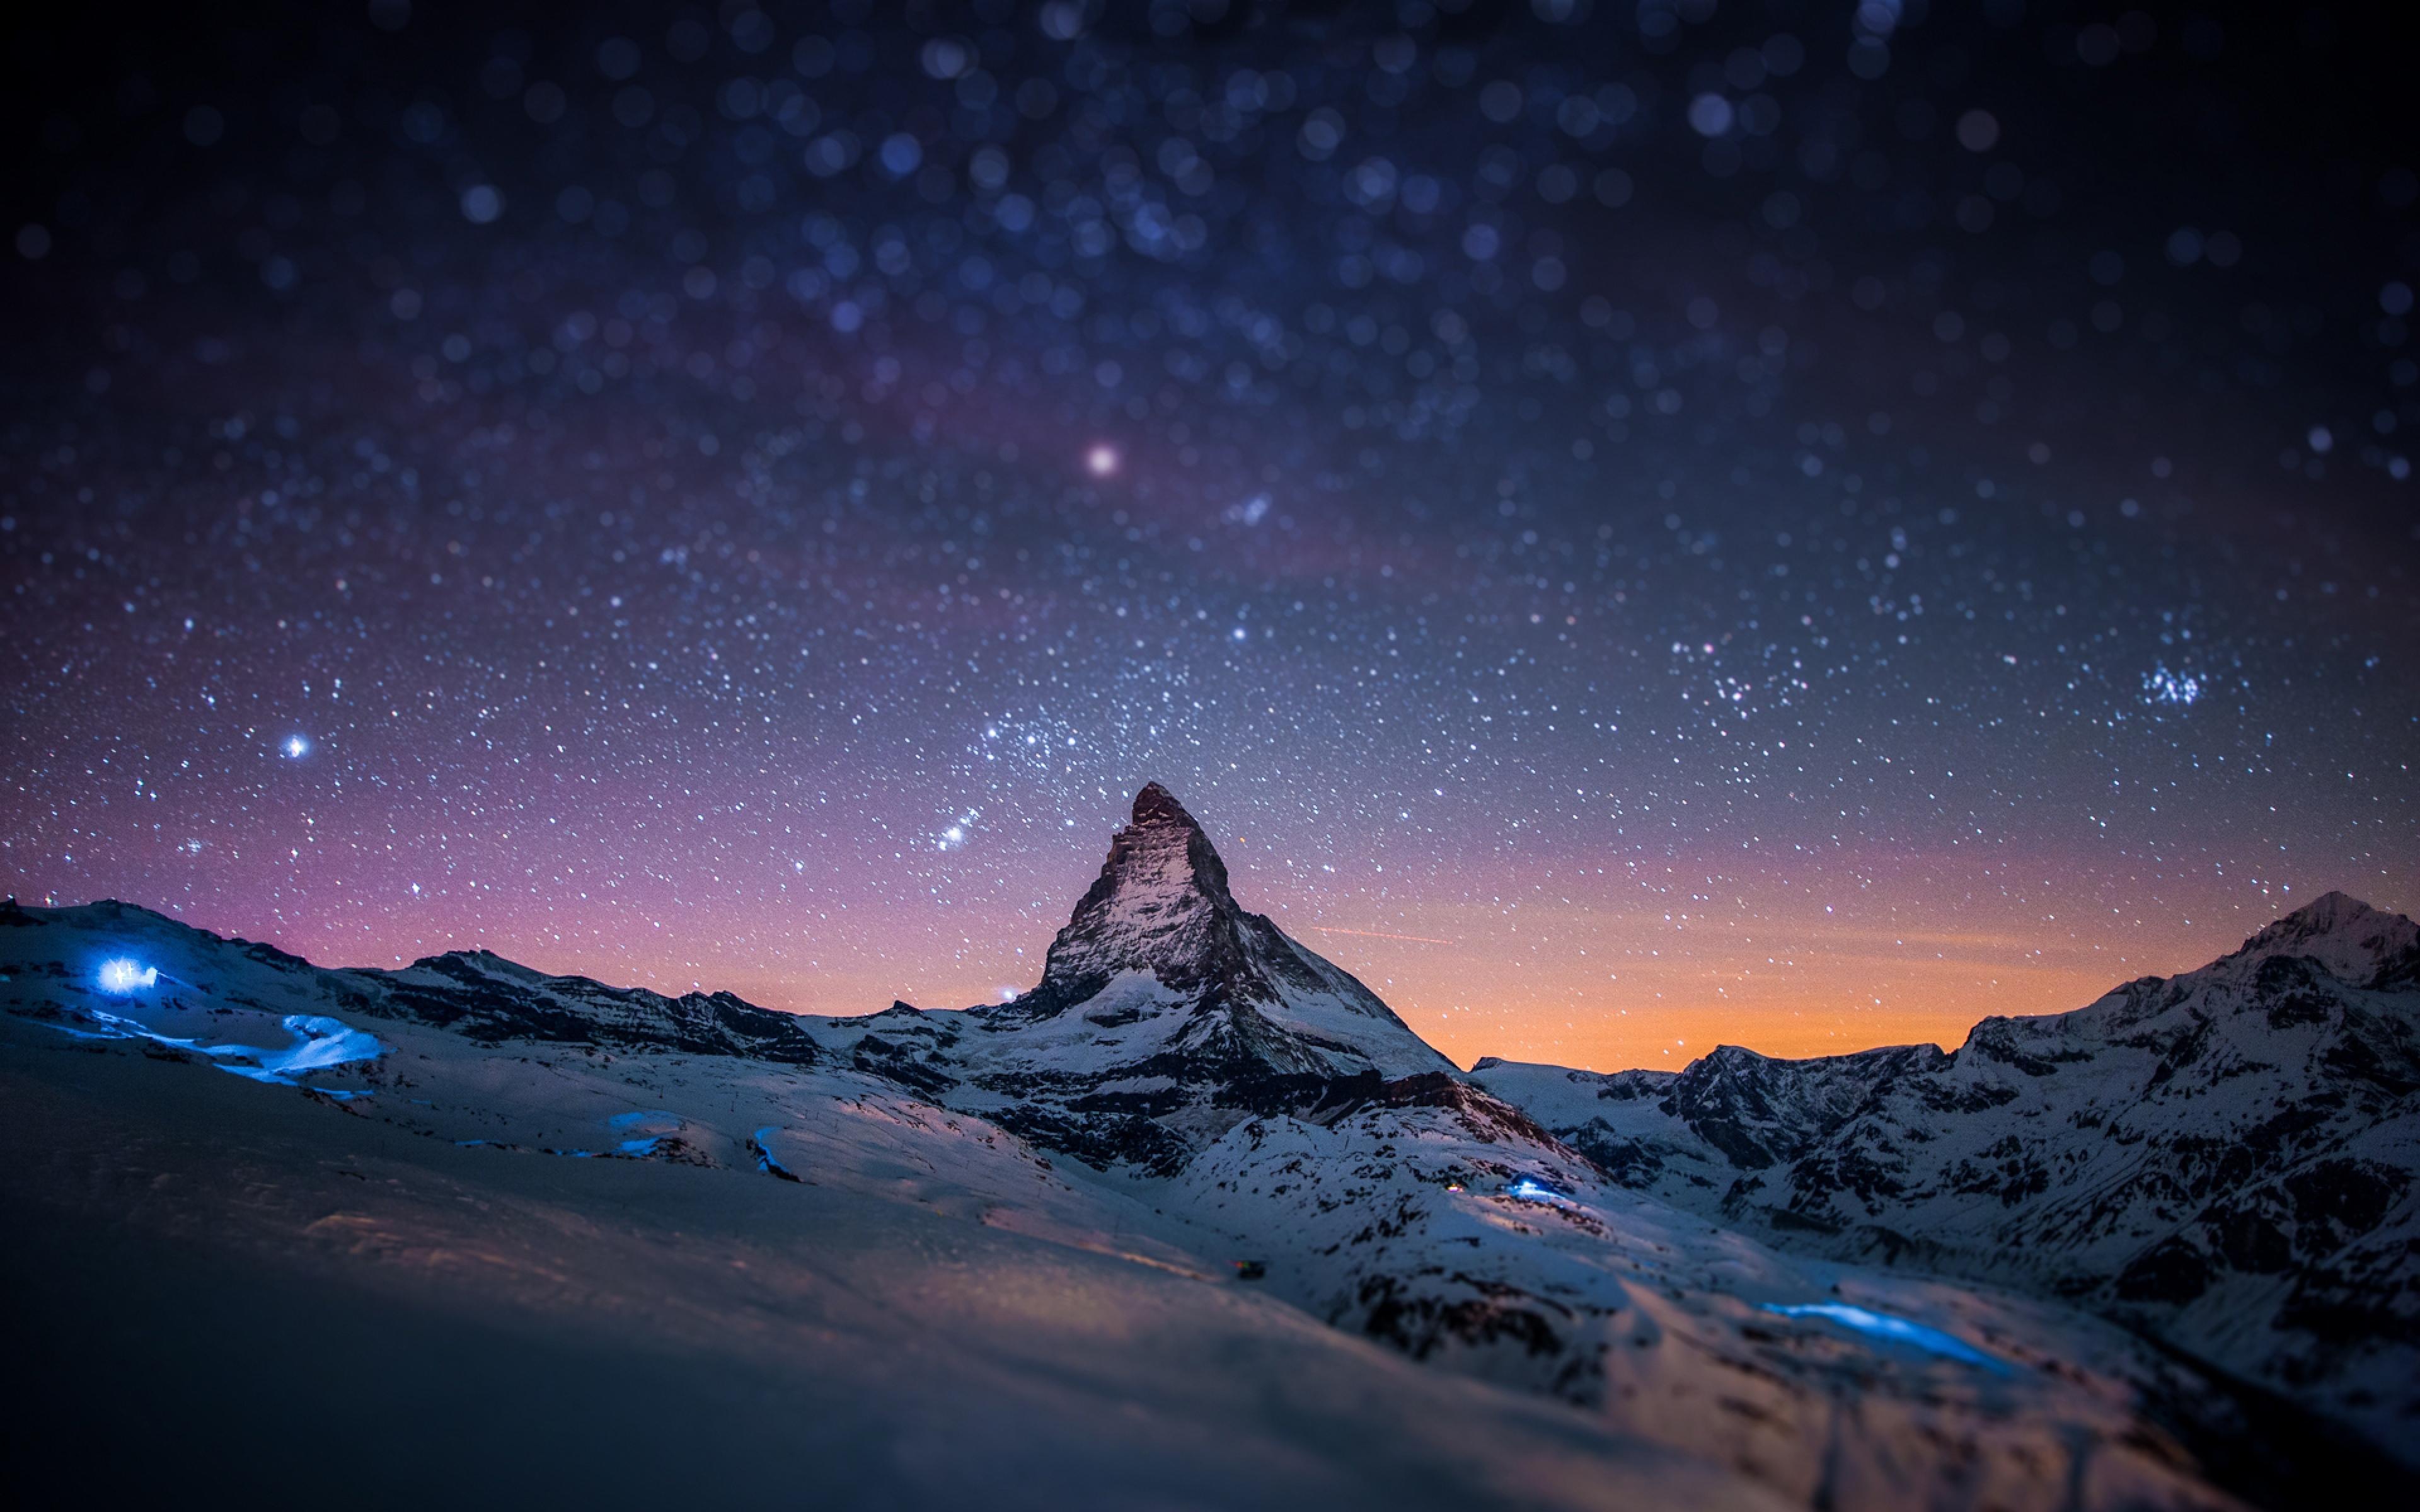 Download HD Mountains Night Sky Blurred Stars Light Show Wallpaper 3840x2400